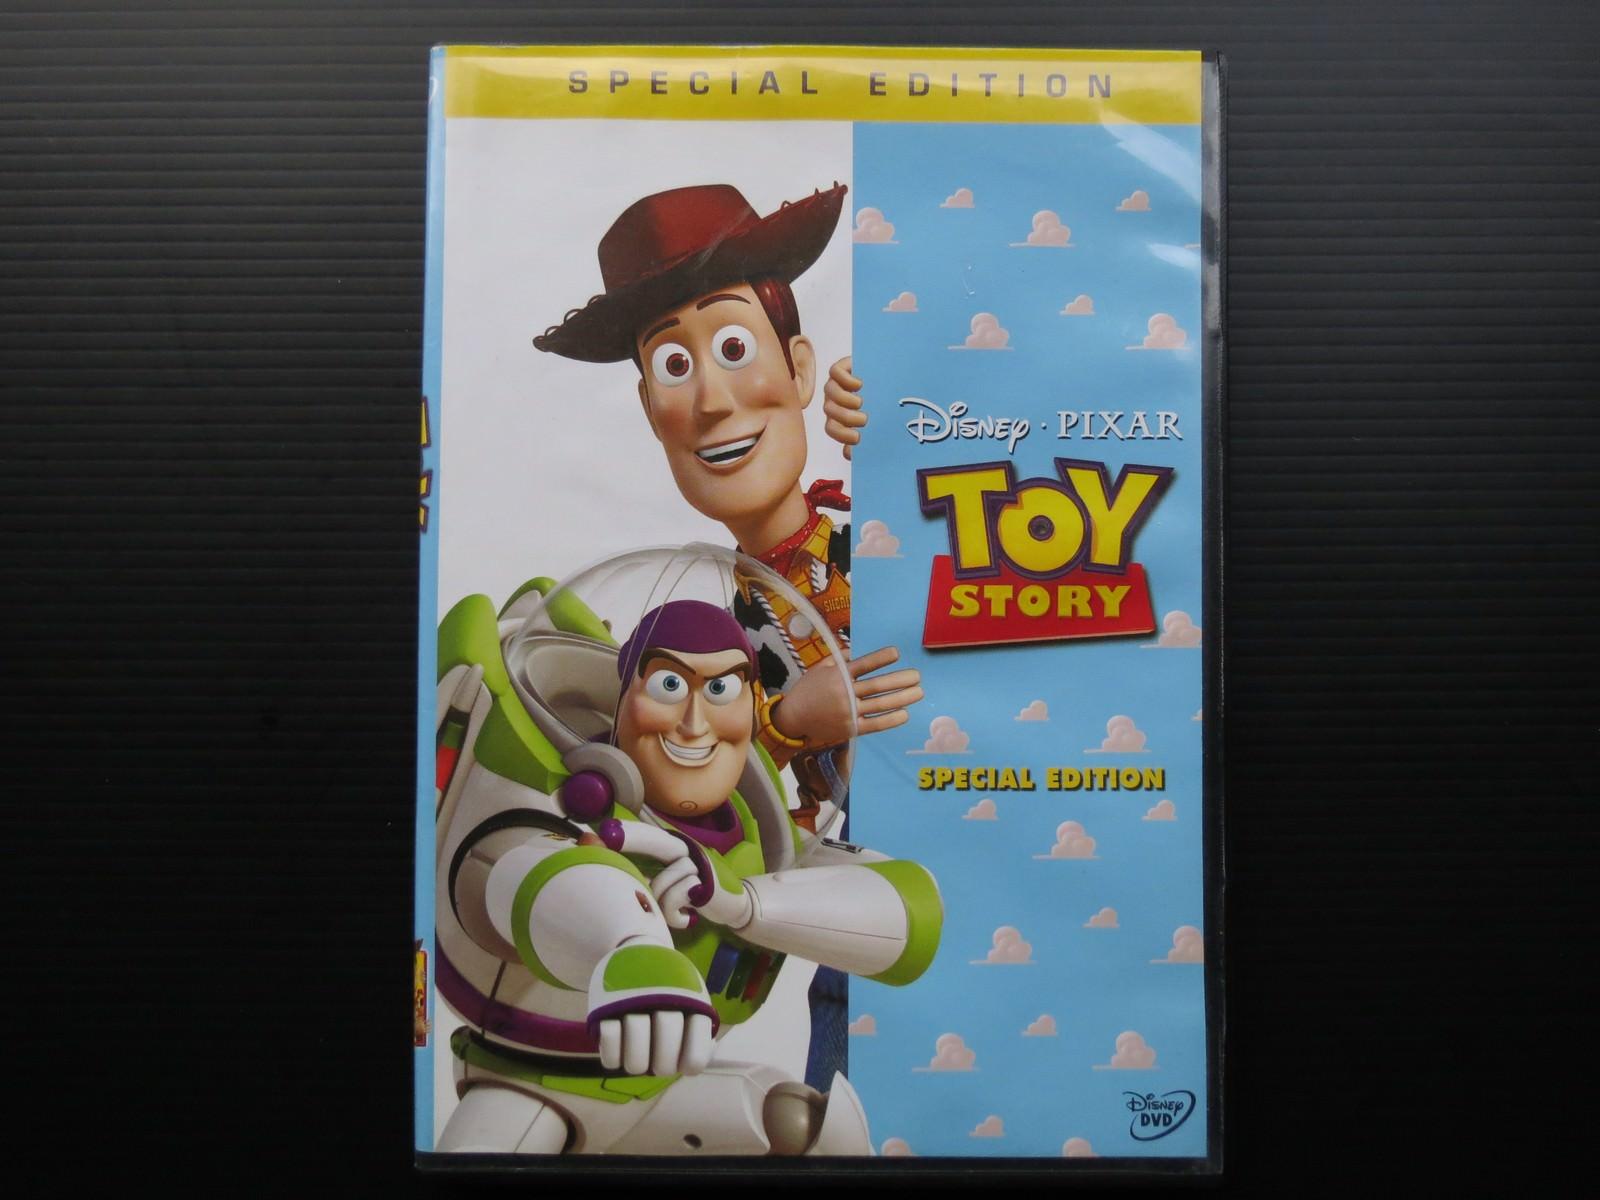 Movie, Toy Story(美國, 1995) / 玩具總動員(台灣) / 玩具总动员(中國) / 反斗奇兵(香港), 電影DVD